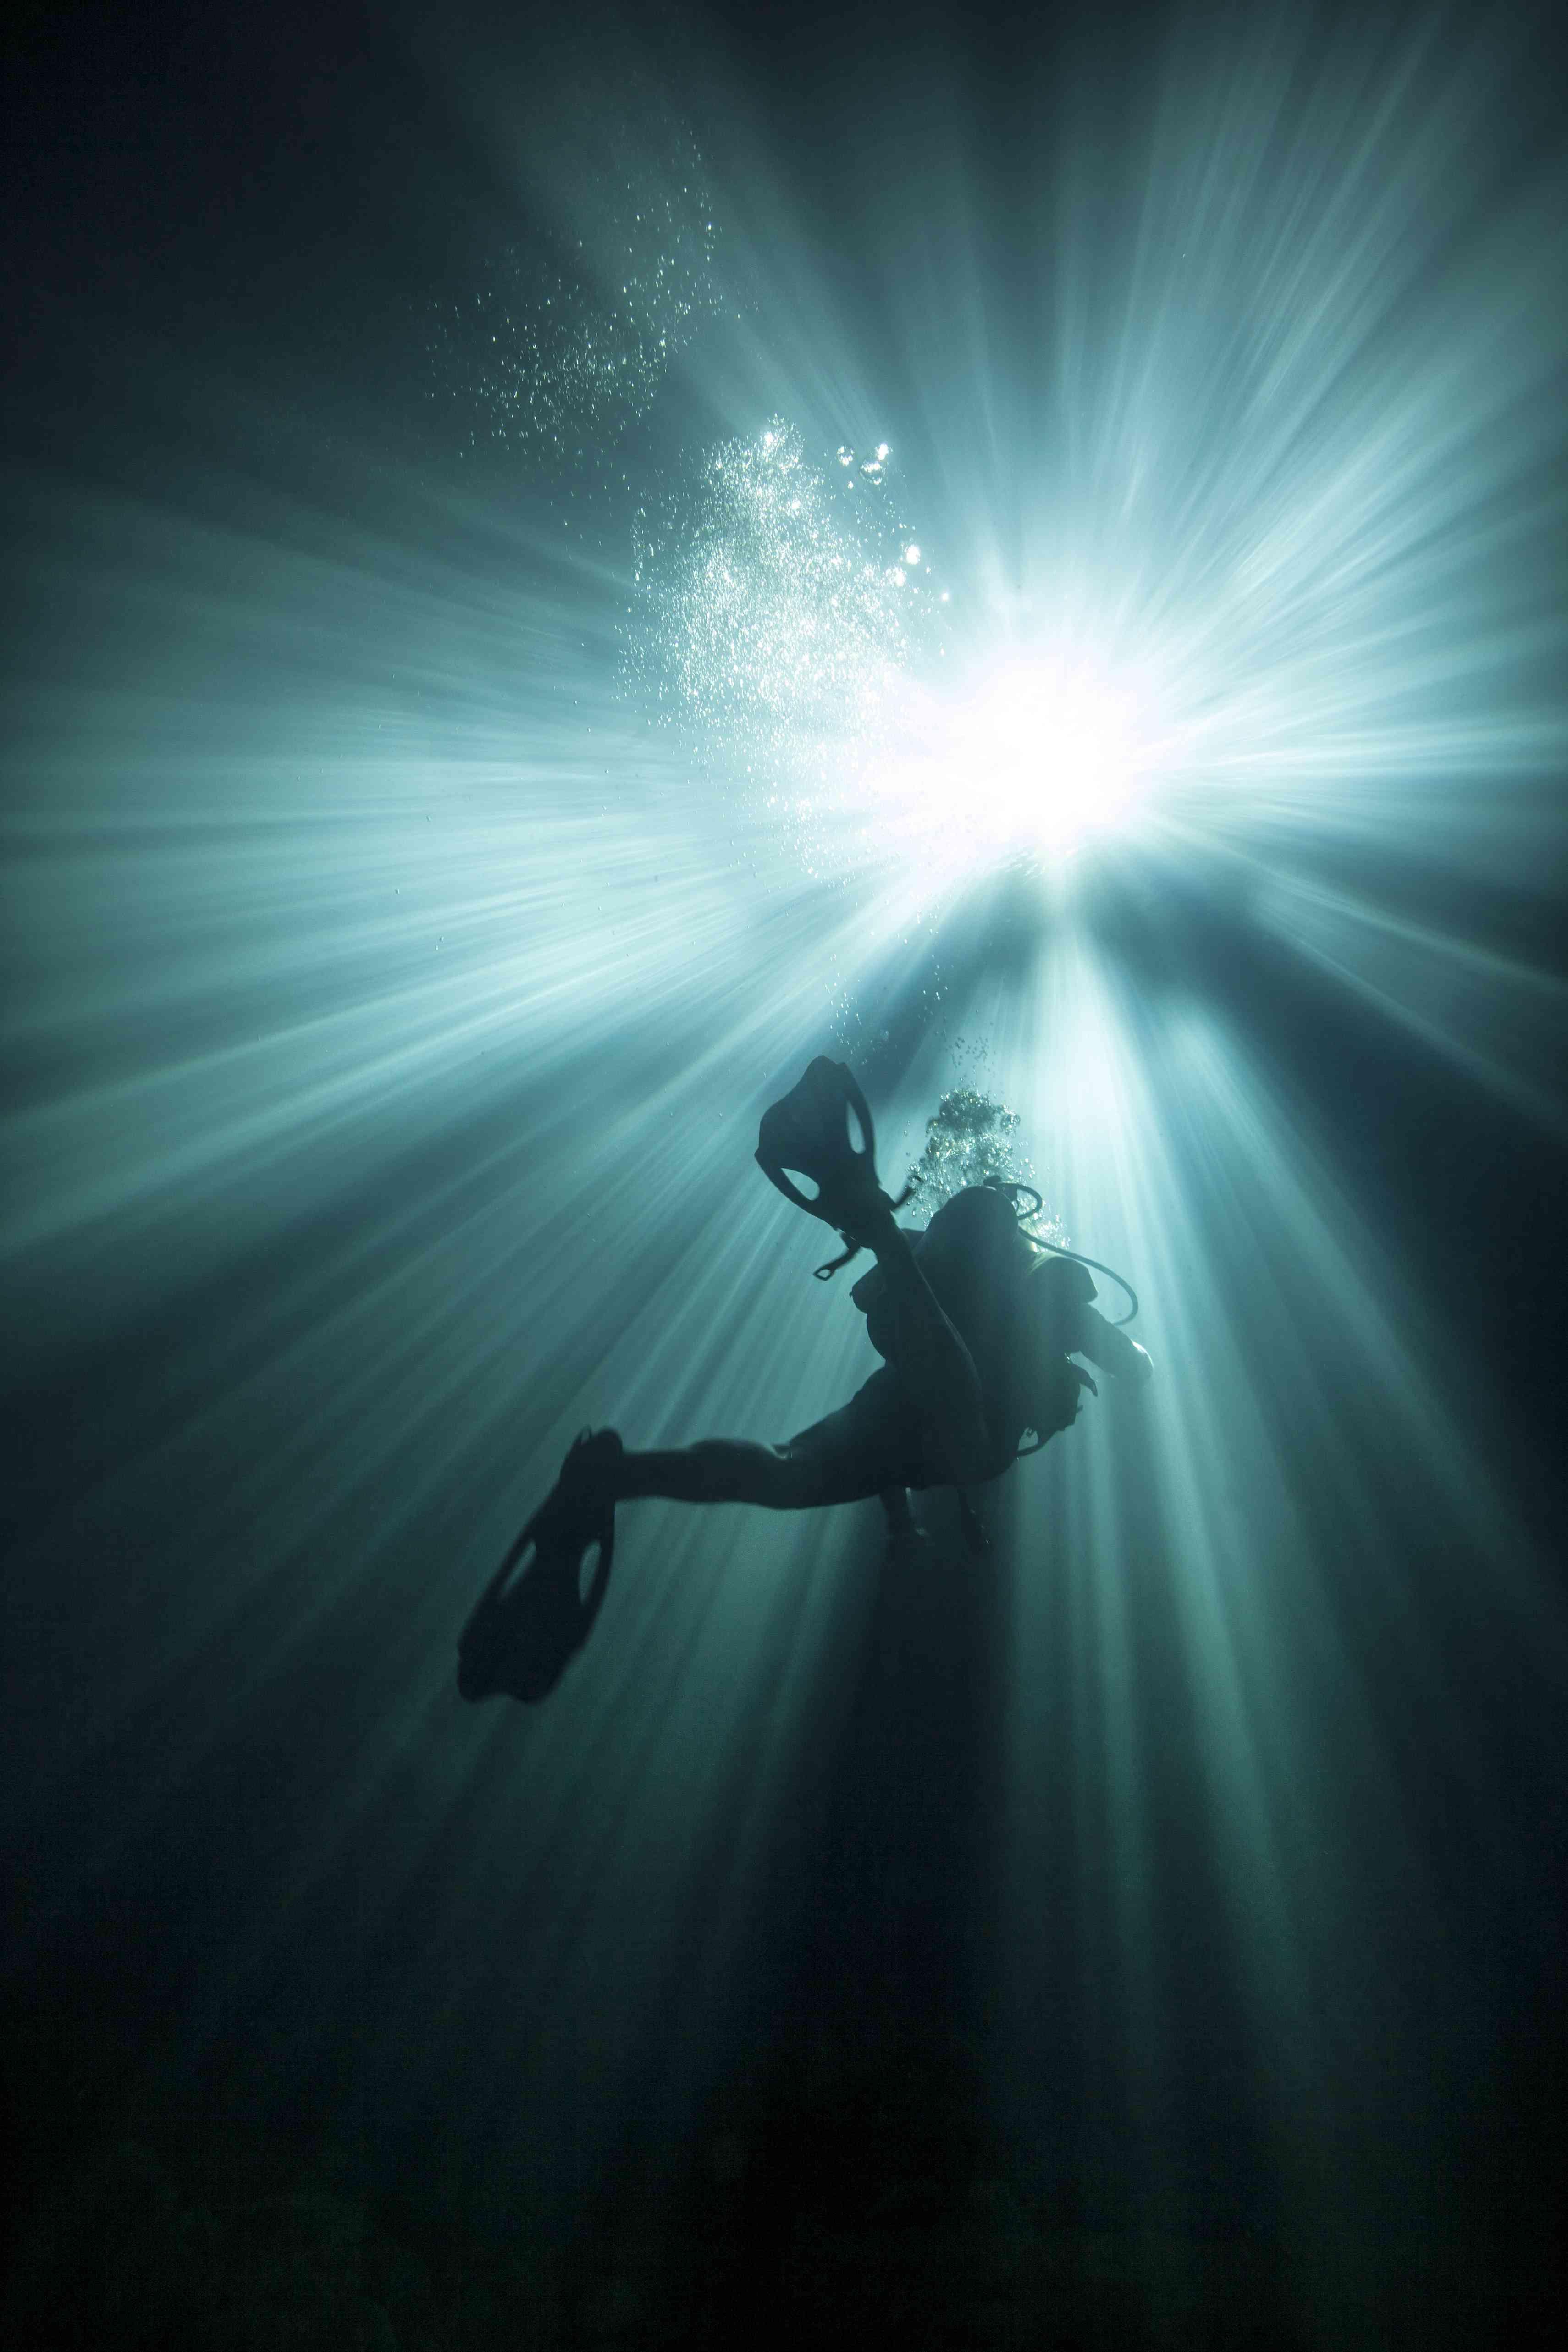 A scuba diver ascends into the light emanating above.